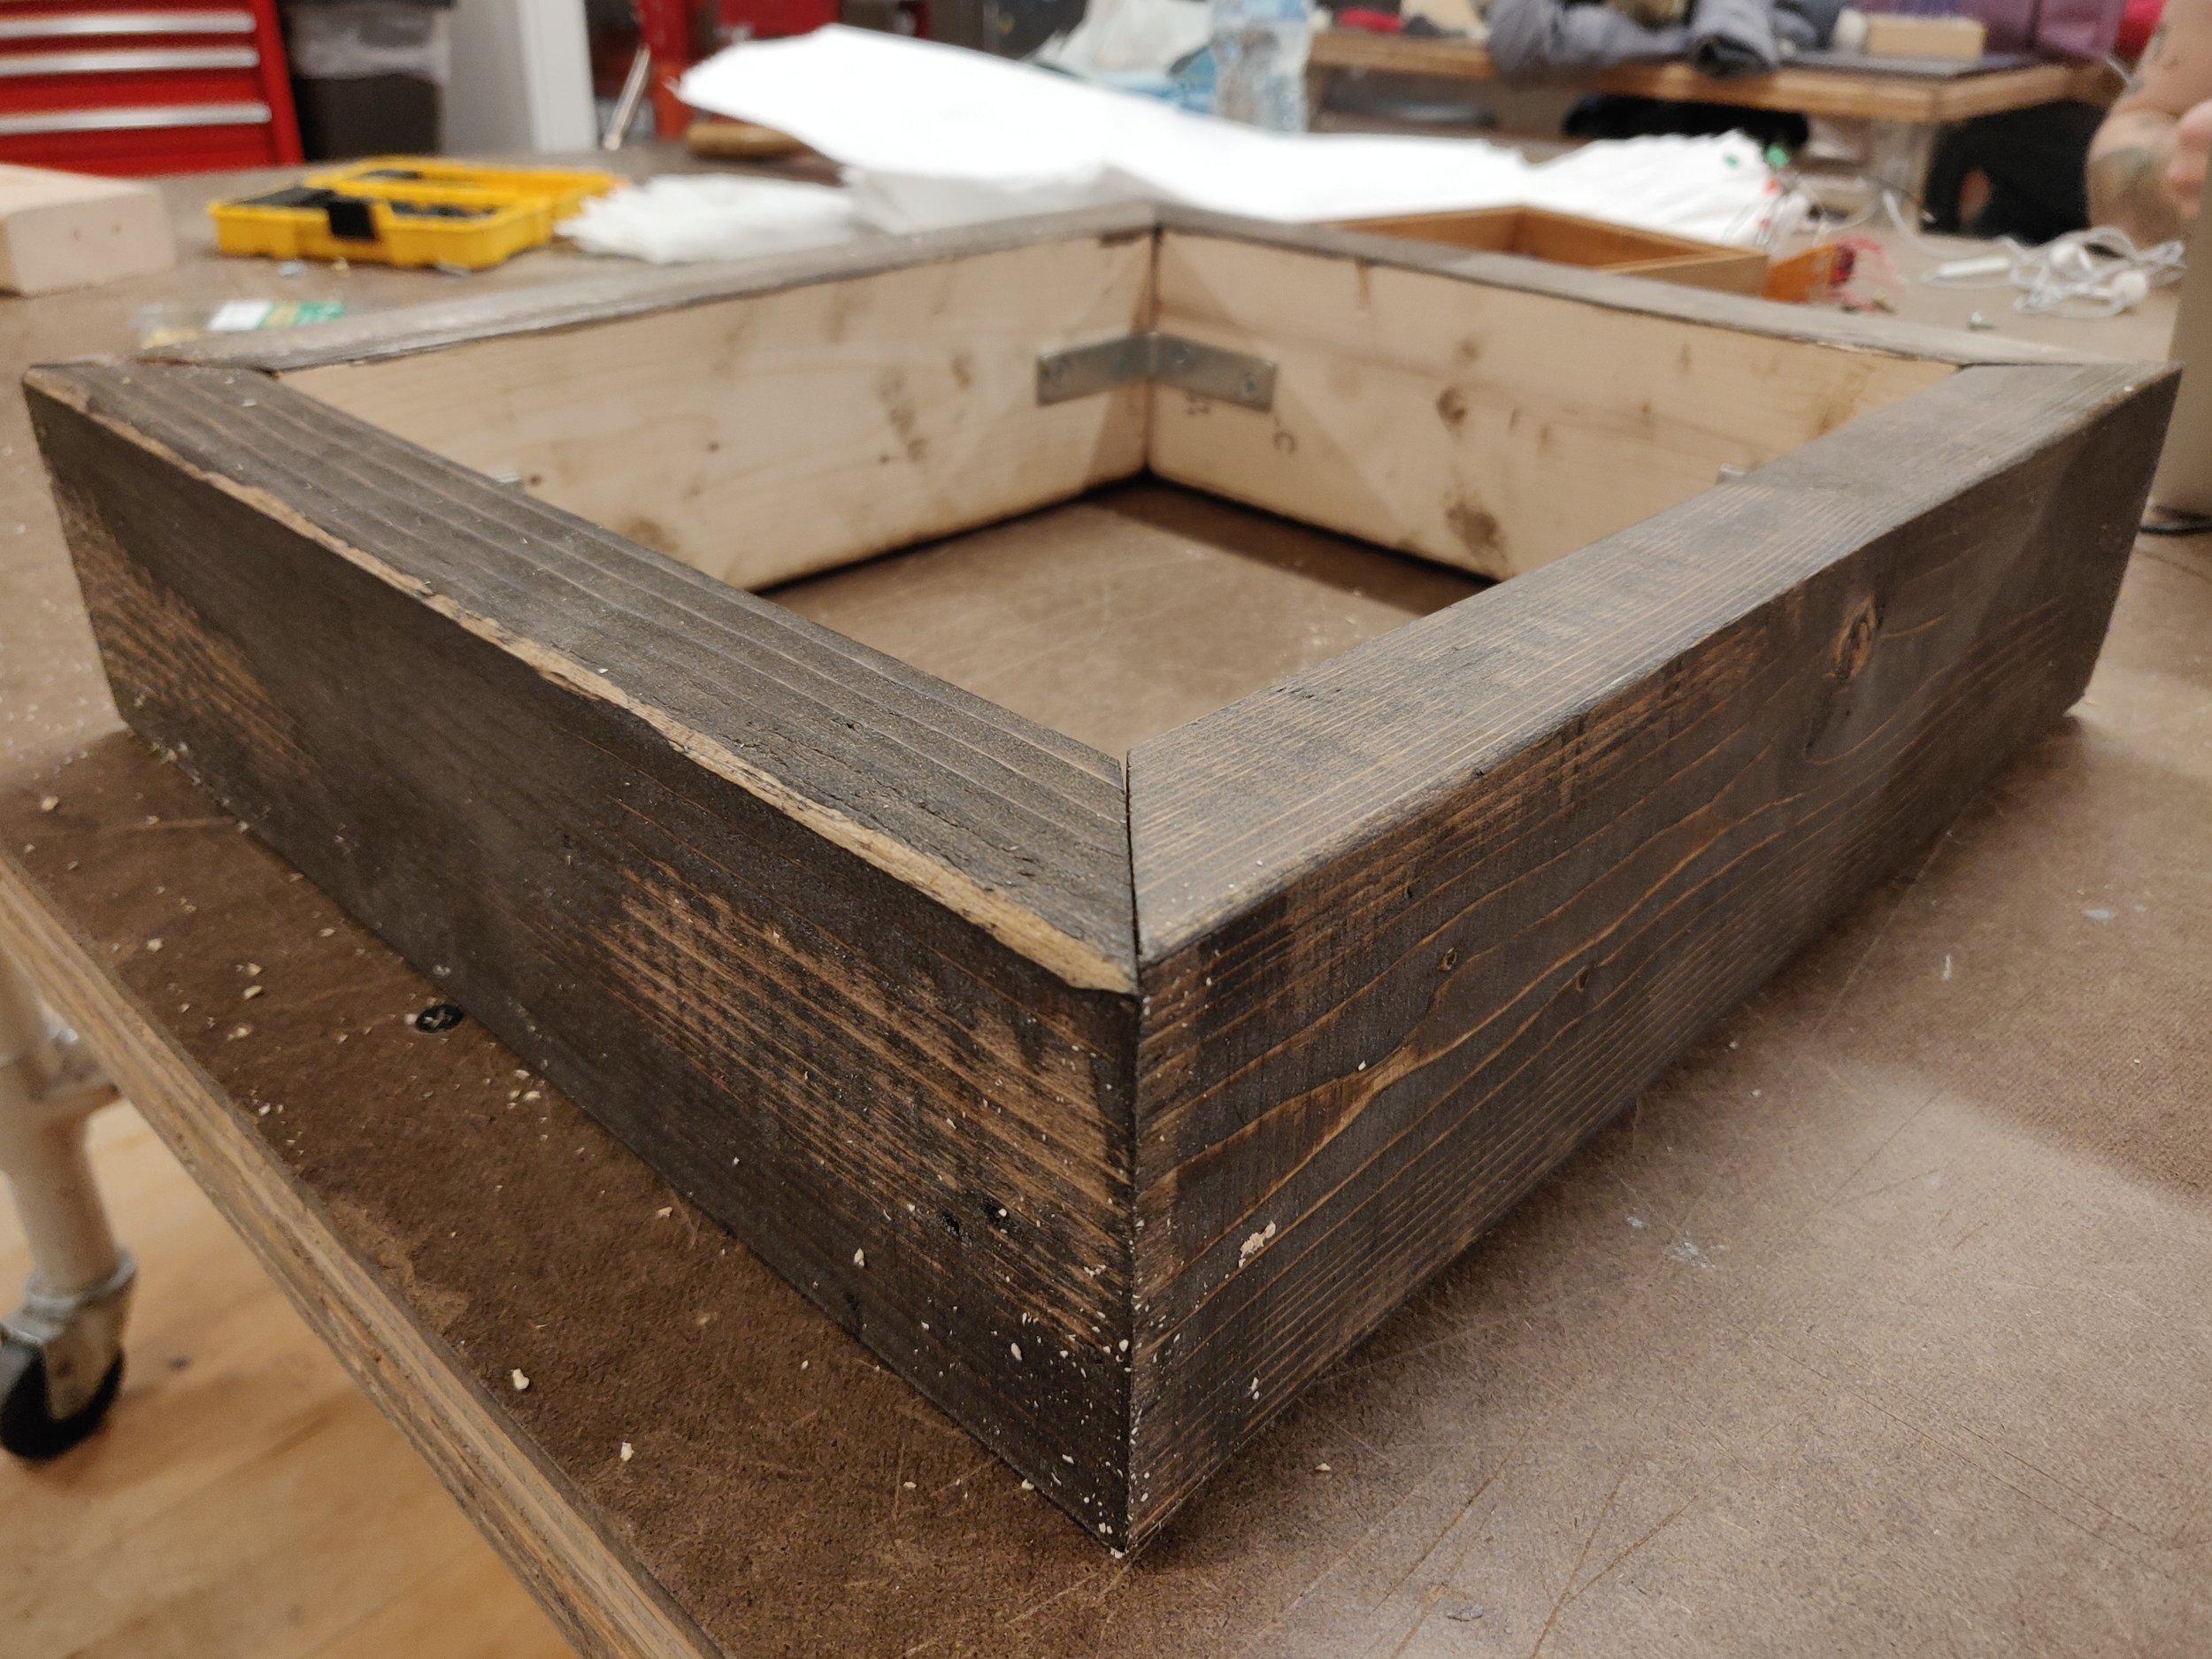 Finalized wooden frame